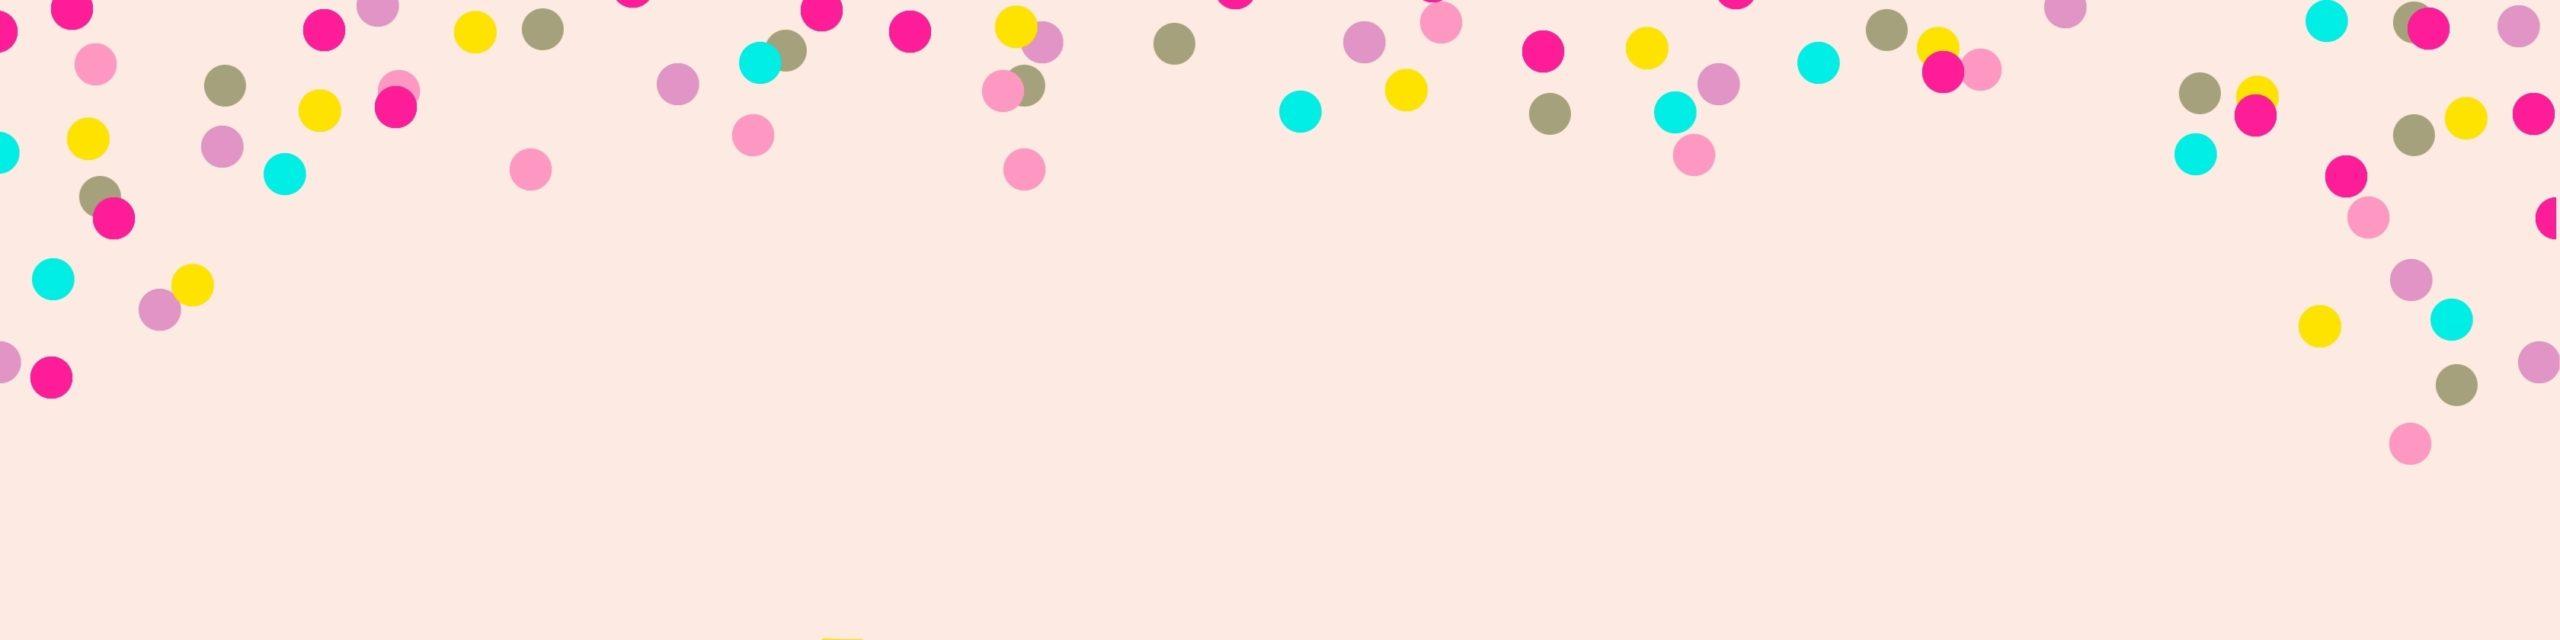 esk015-confetti-etsy_5f9aa53e121368_99342416_1